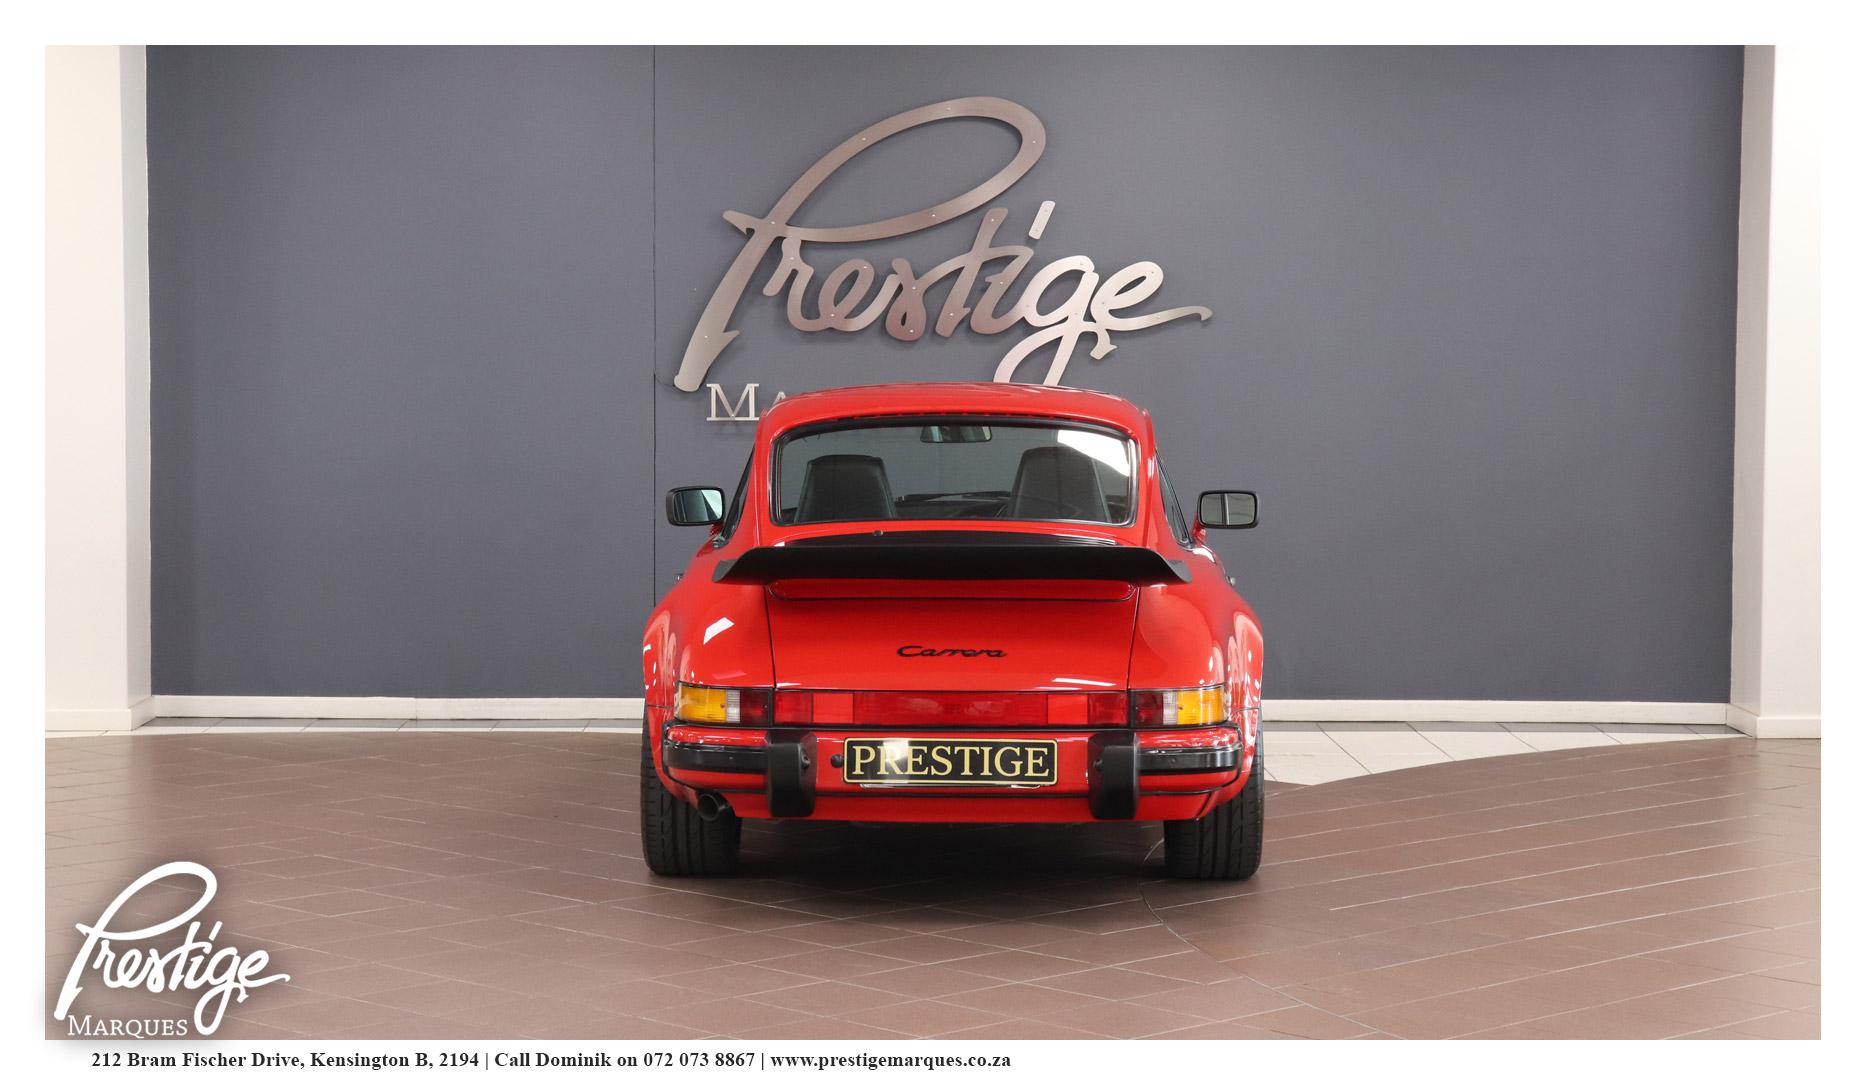 1989-Porsche-911-Carerra-3.2-350-Prestige-Marques-Randburg-Sandton-5